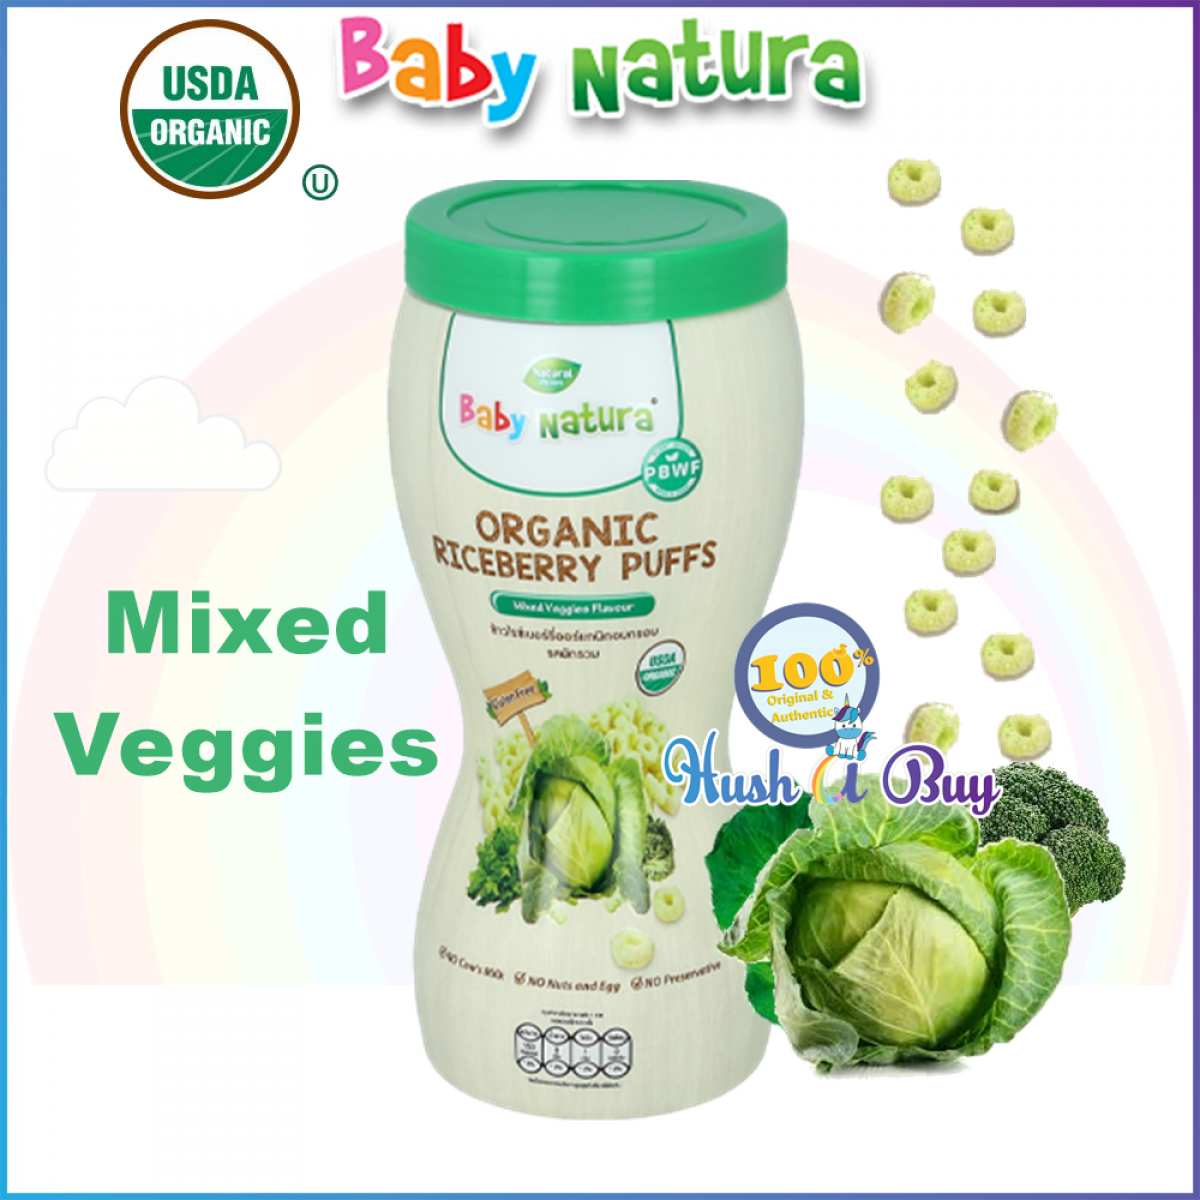 Baby Natura Organic Riceberry Puffs - Apple Carrot Pumpkin Veggies